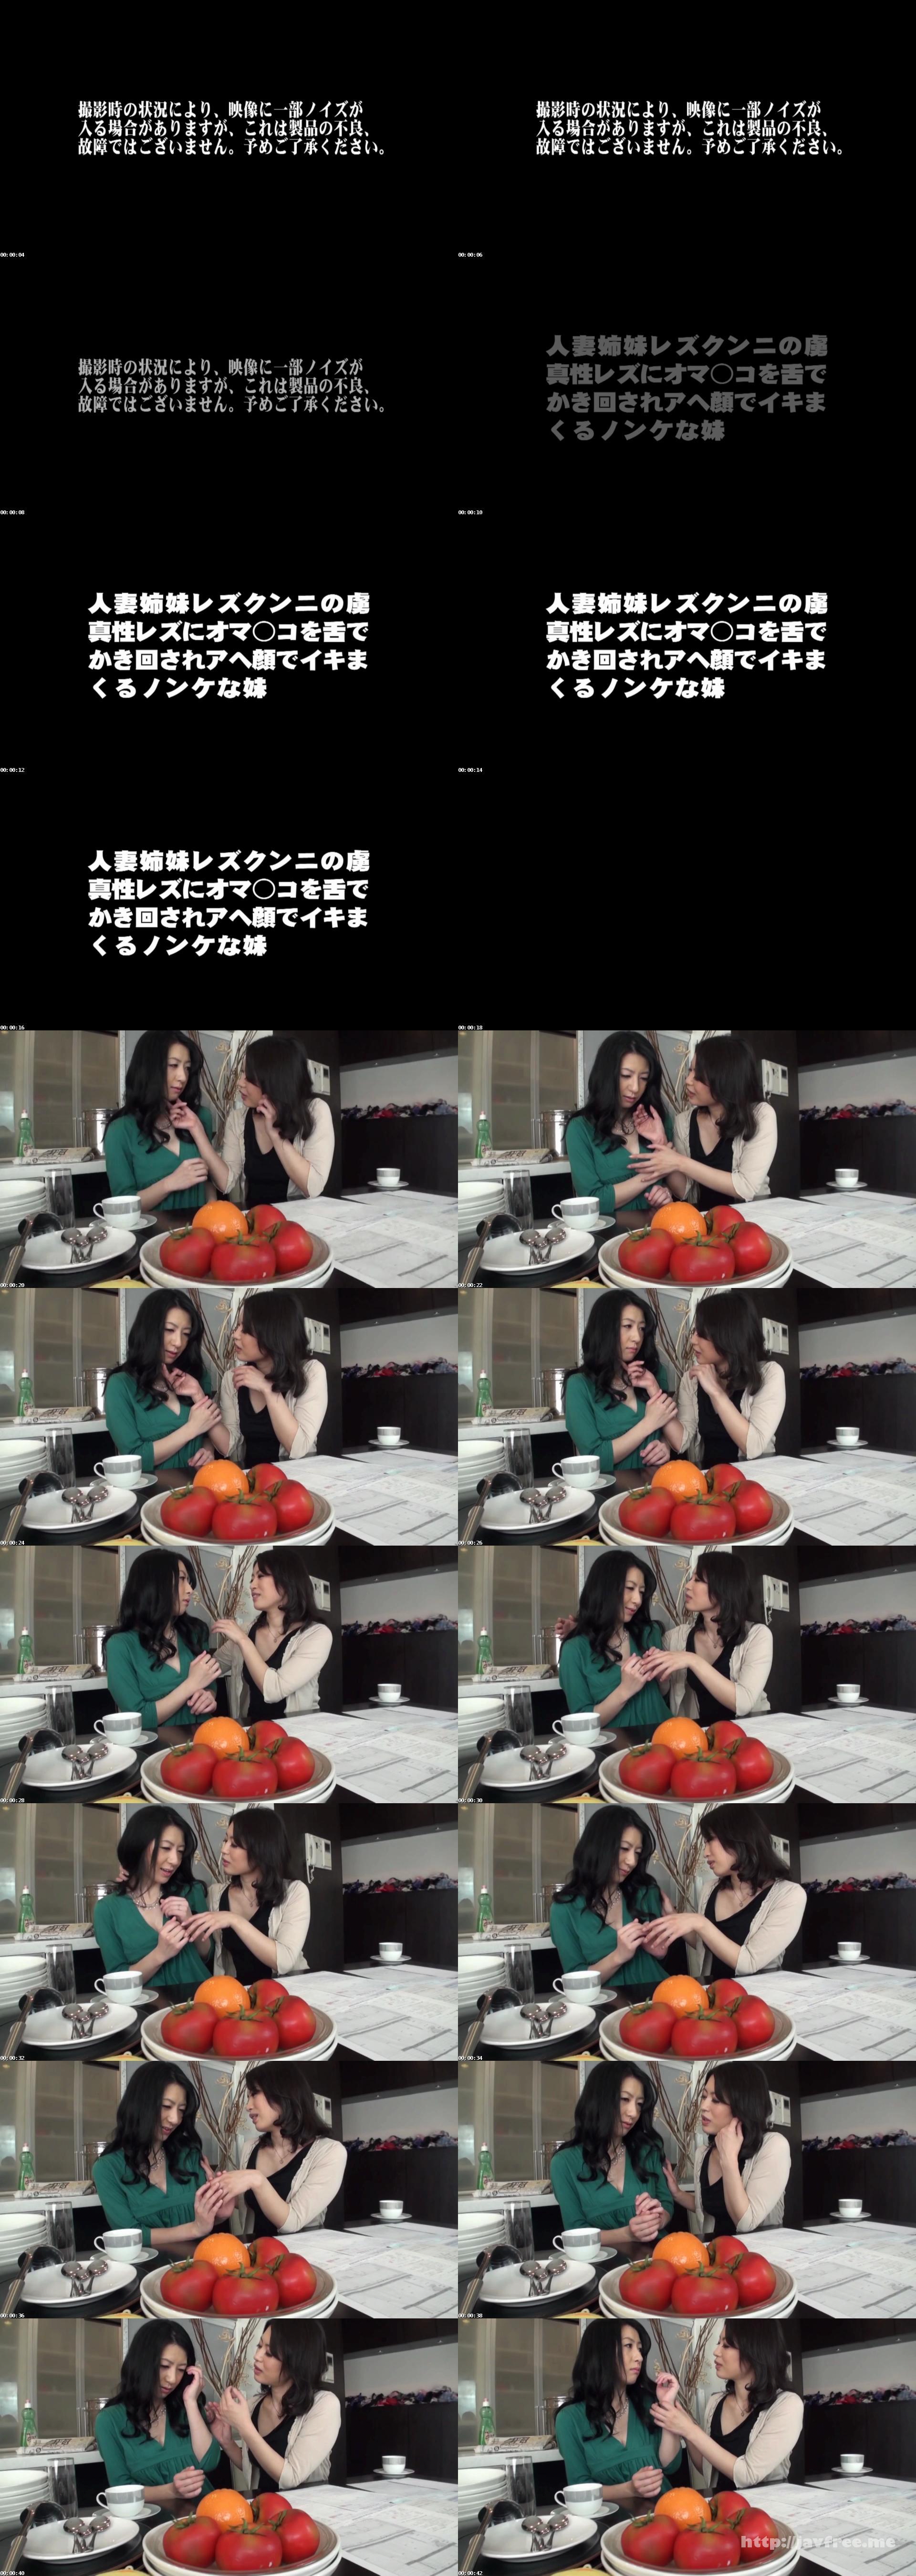 [NASS-540] 人妻姉妹レズクンニの虜 真性レズにオマ○コを舌でかき回されアヘ顔でイキまくるノンケな妹 - image NASS-540 on https://javfree.me